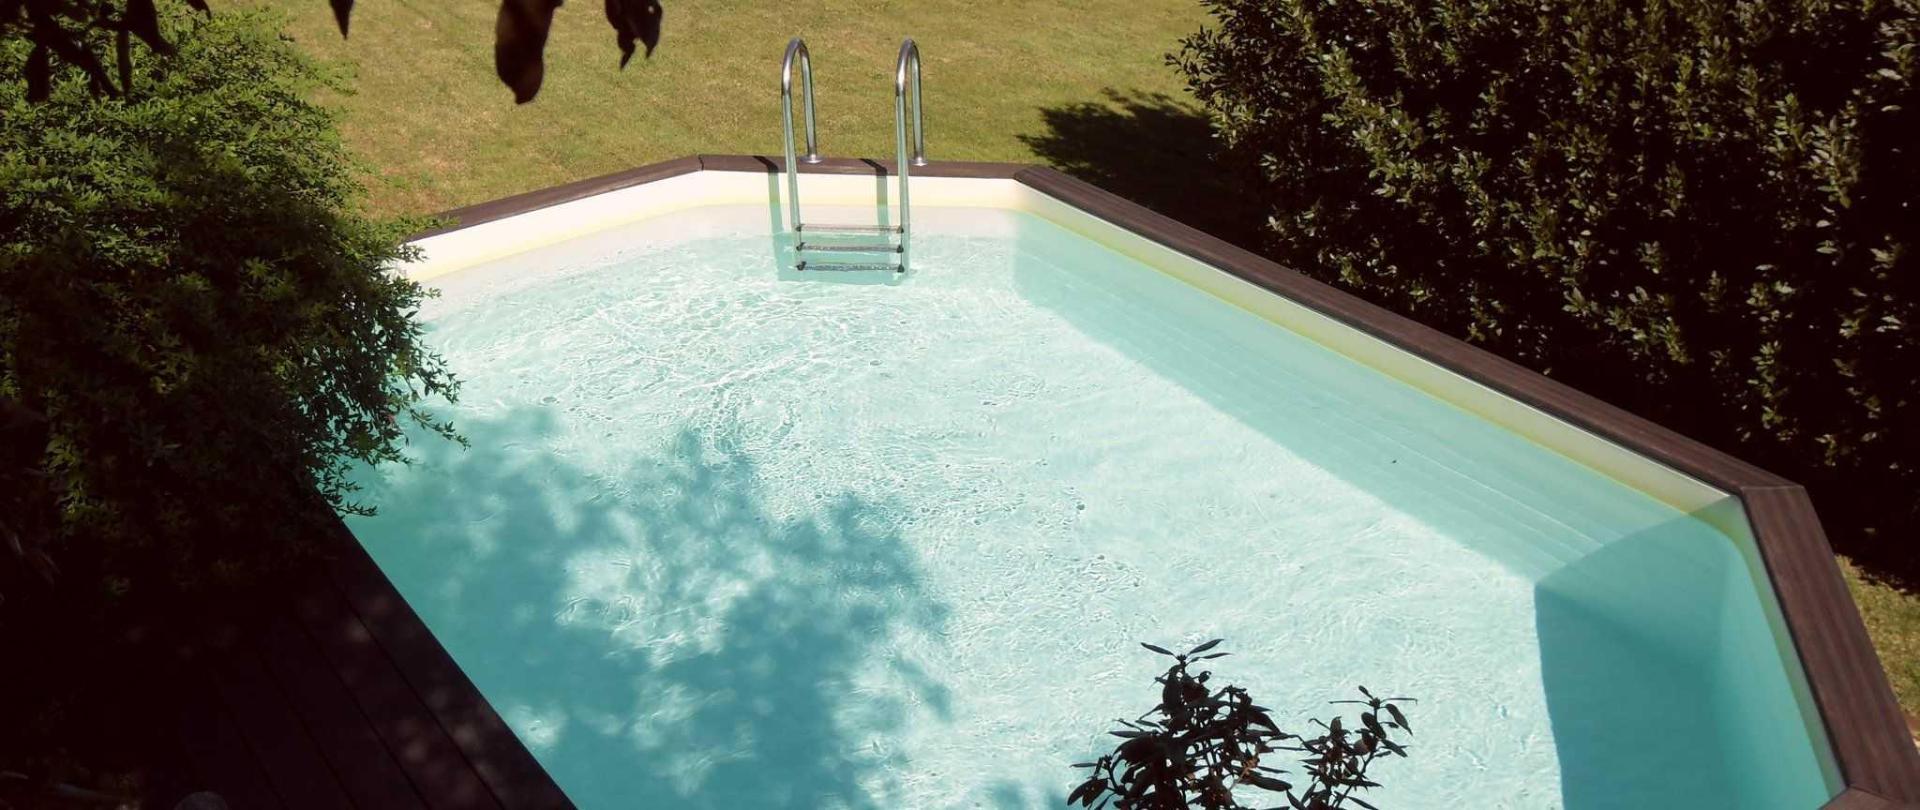 27_veduta-piscina-2.JPG